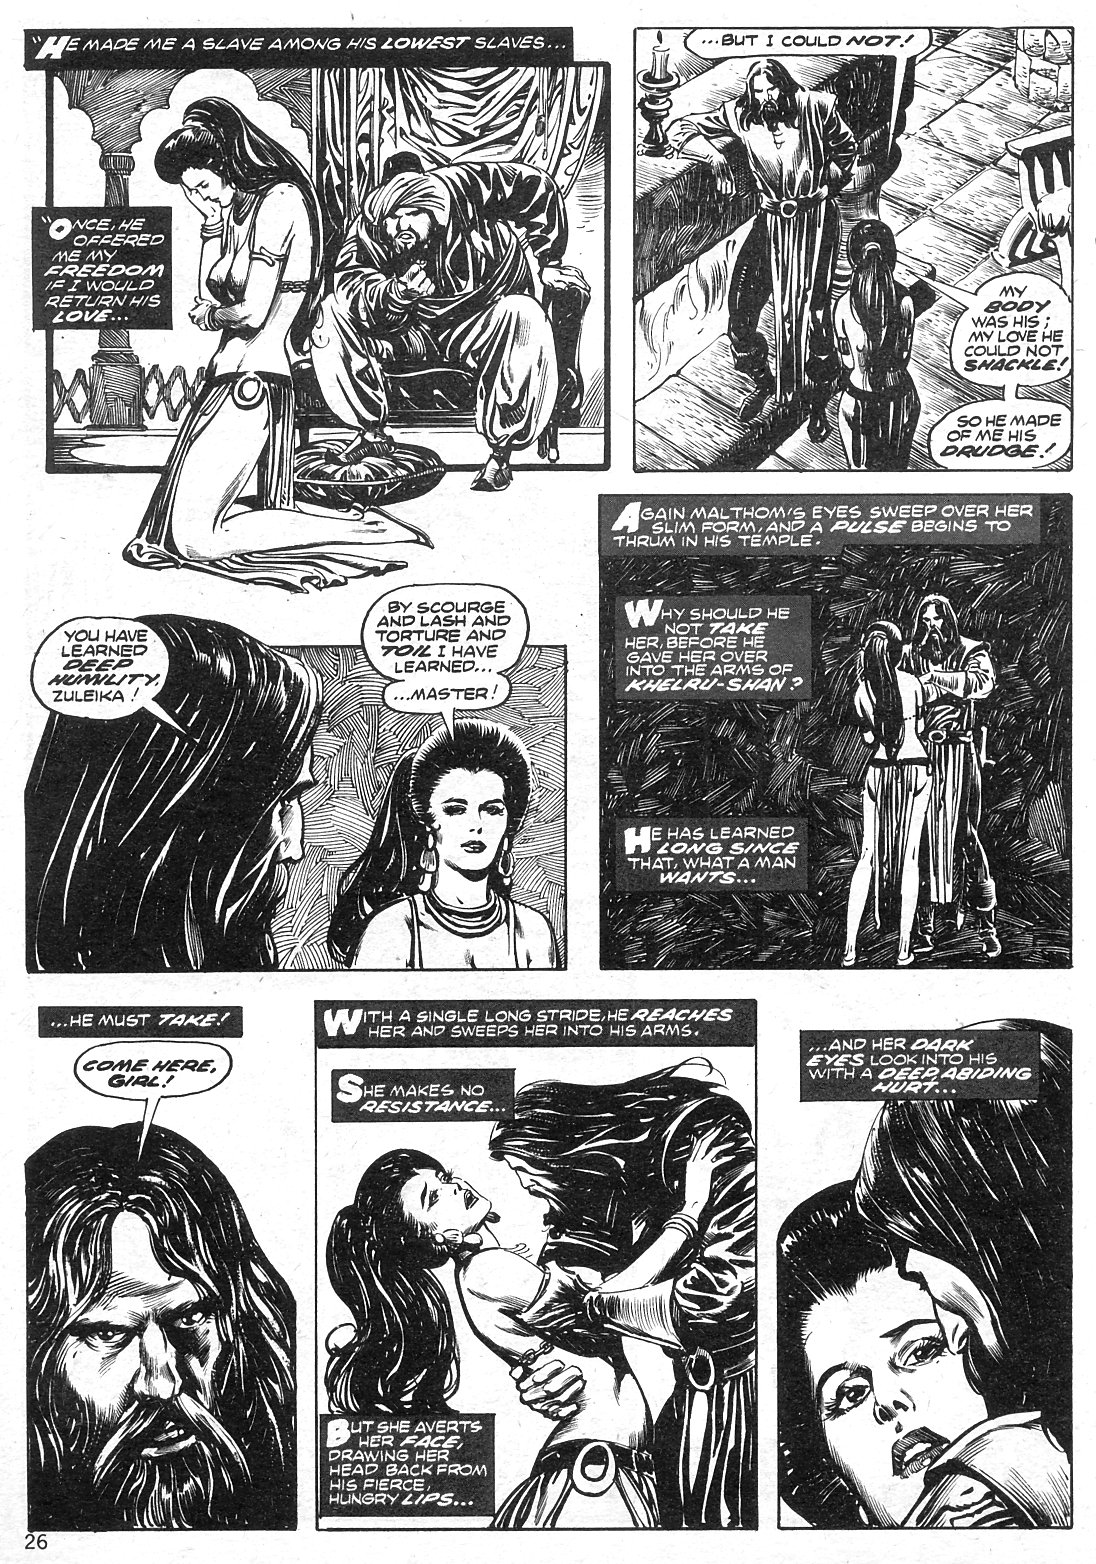 comiconli #224 - English 26